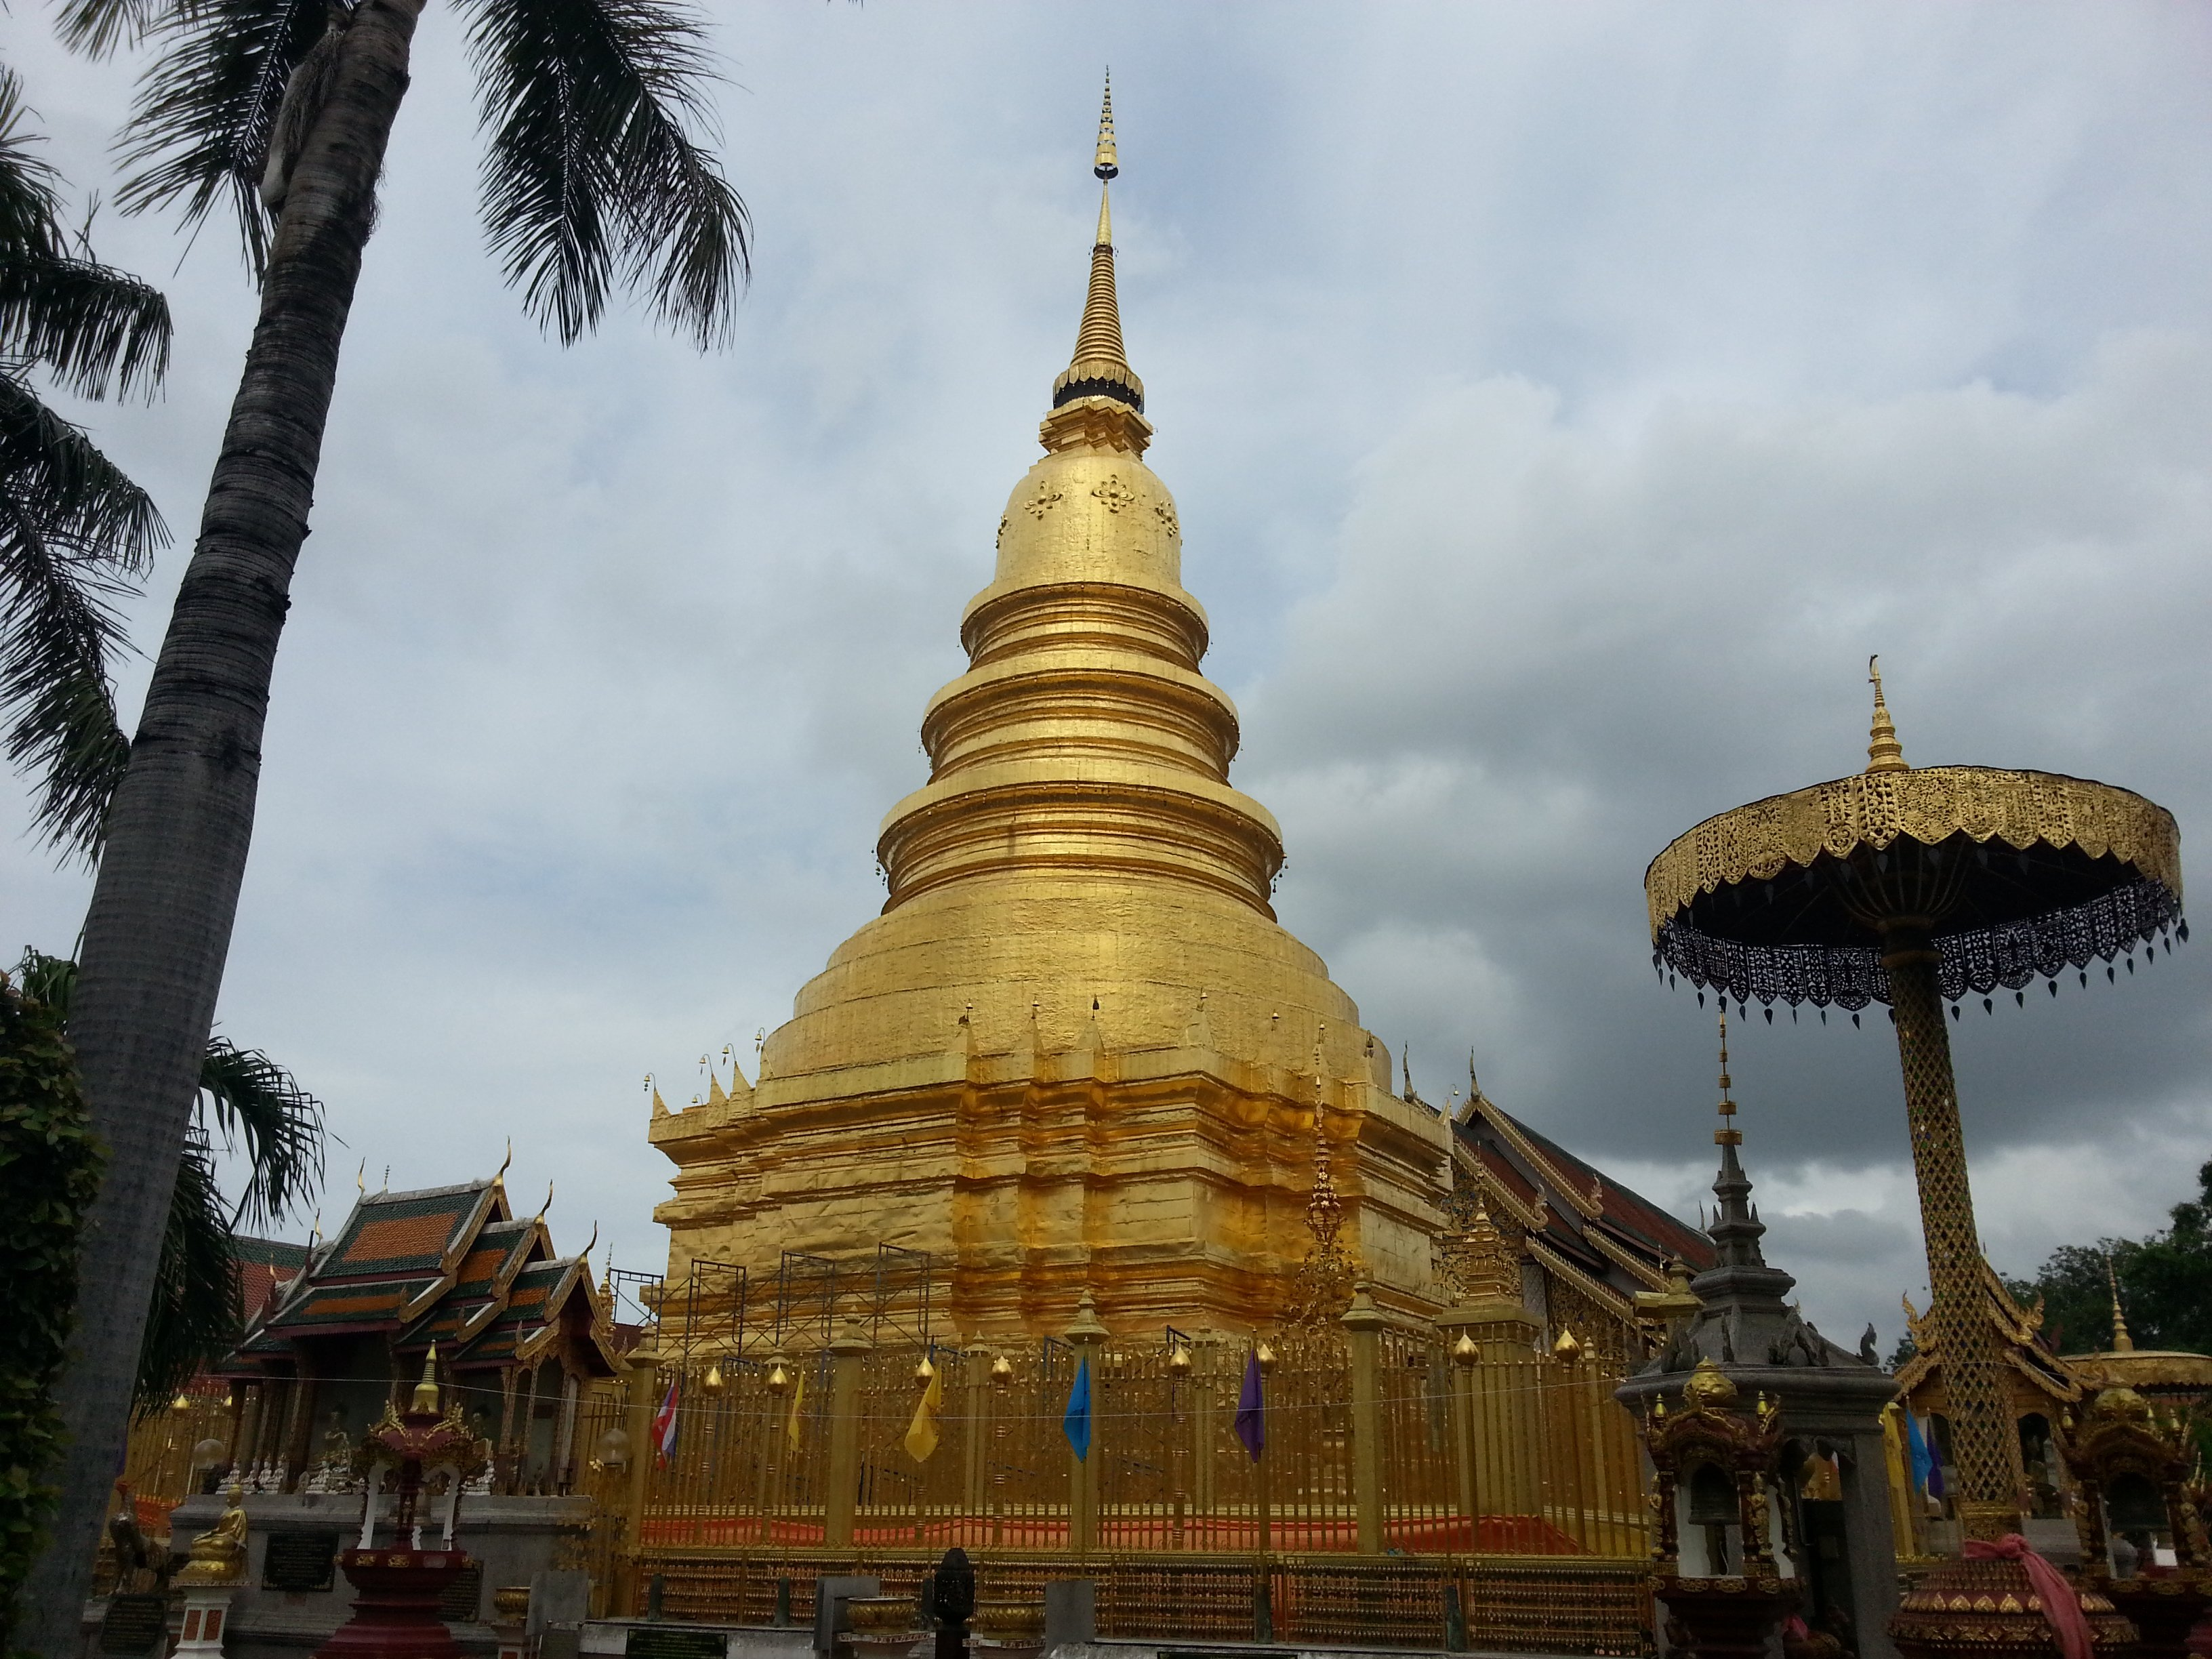 Phra Maha That Chedi at Wat Phra That Hariphunchai